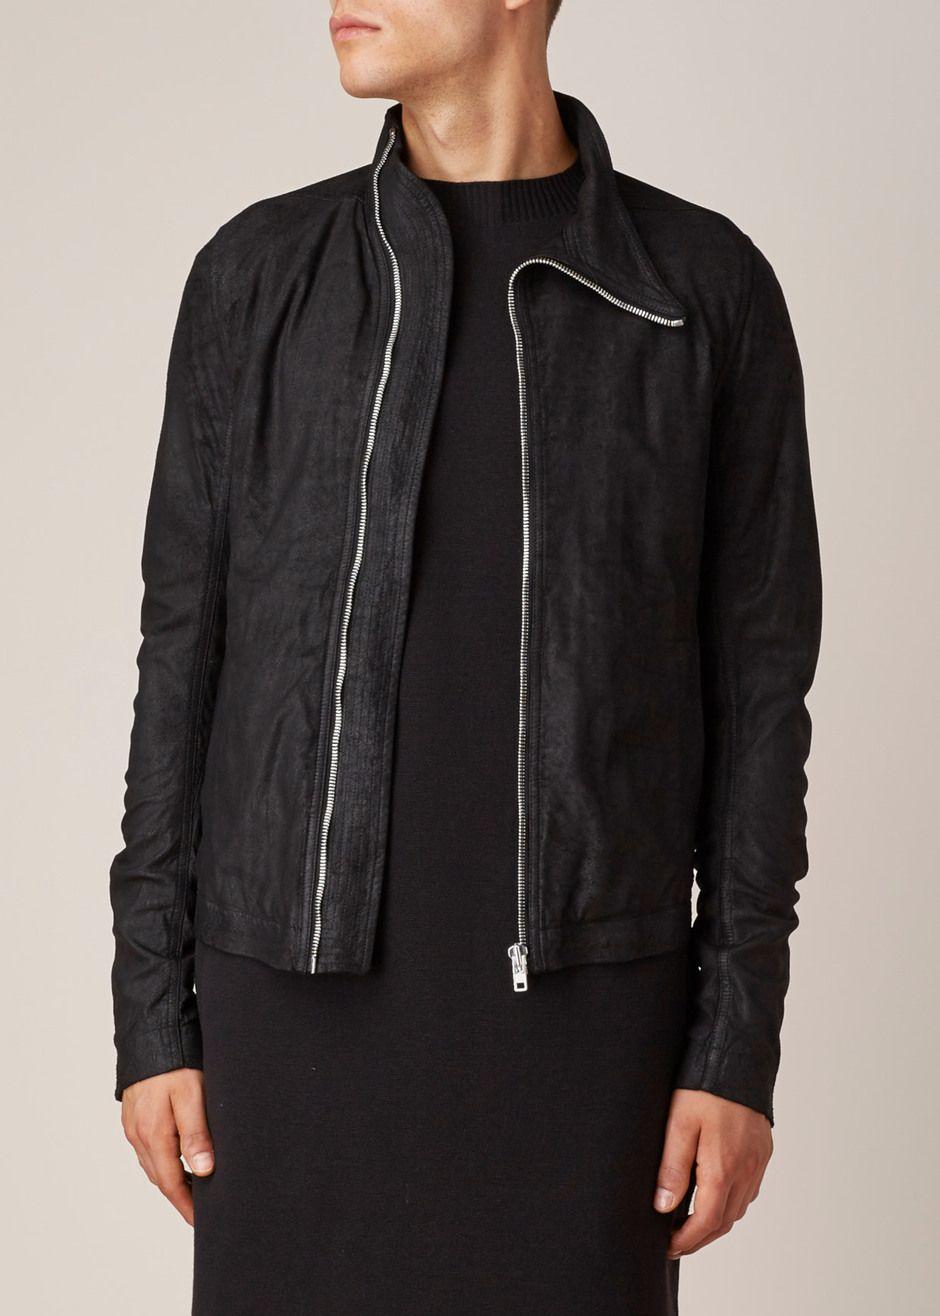 Leather jacket aesthetic - Rick Owens Funnel Neck Leather Jacket Black